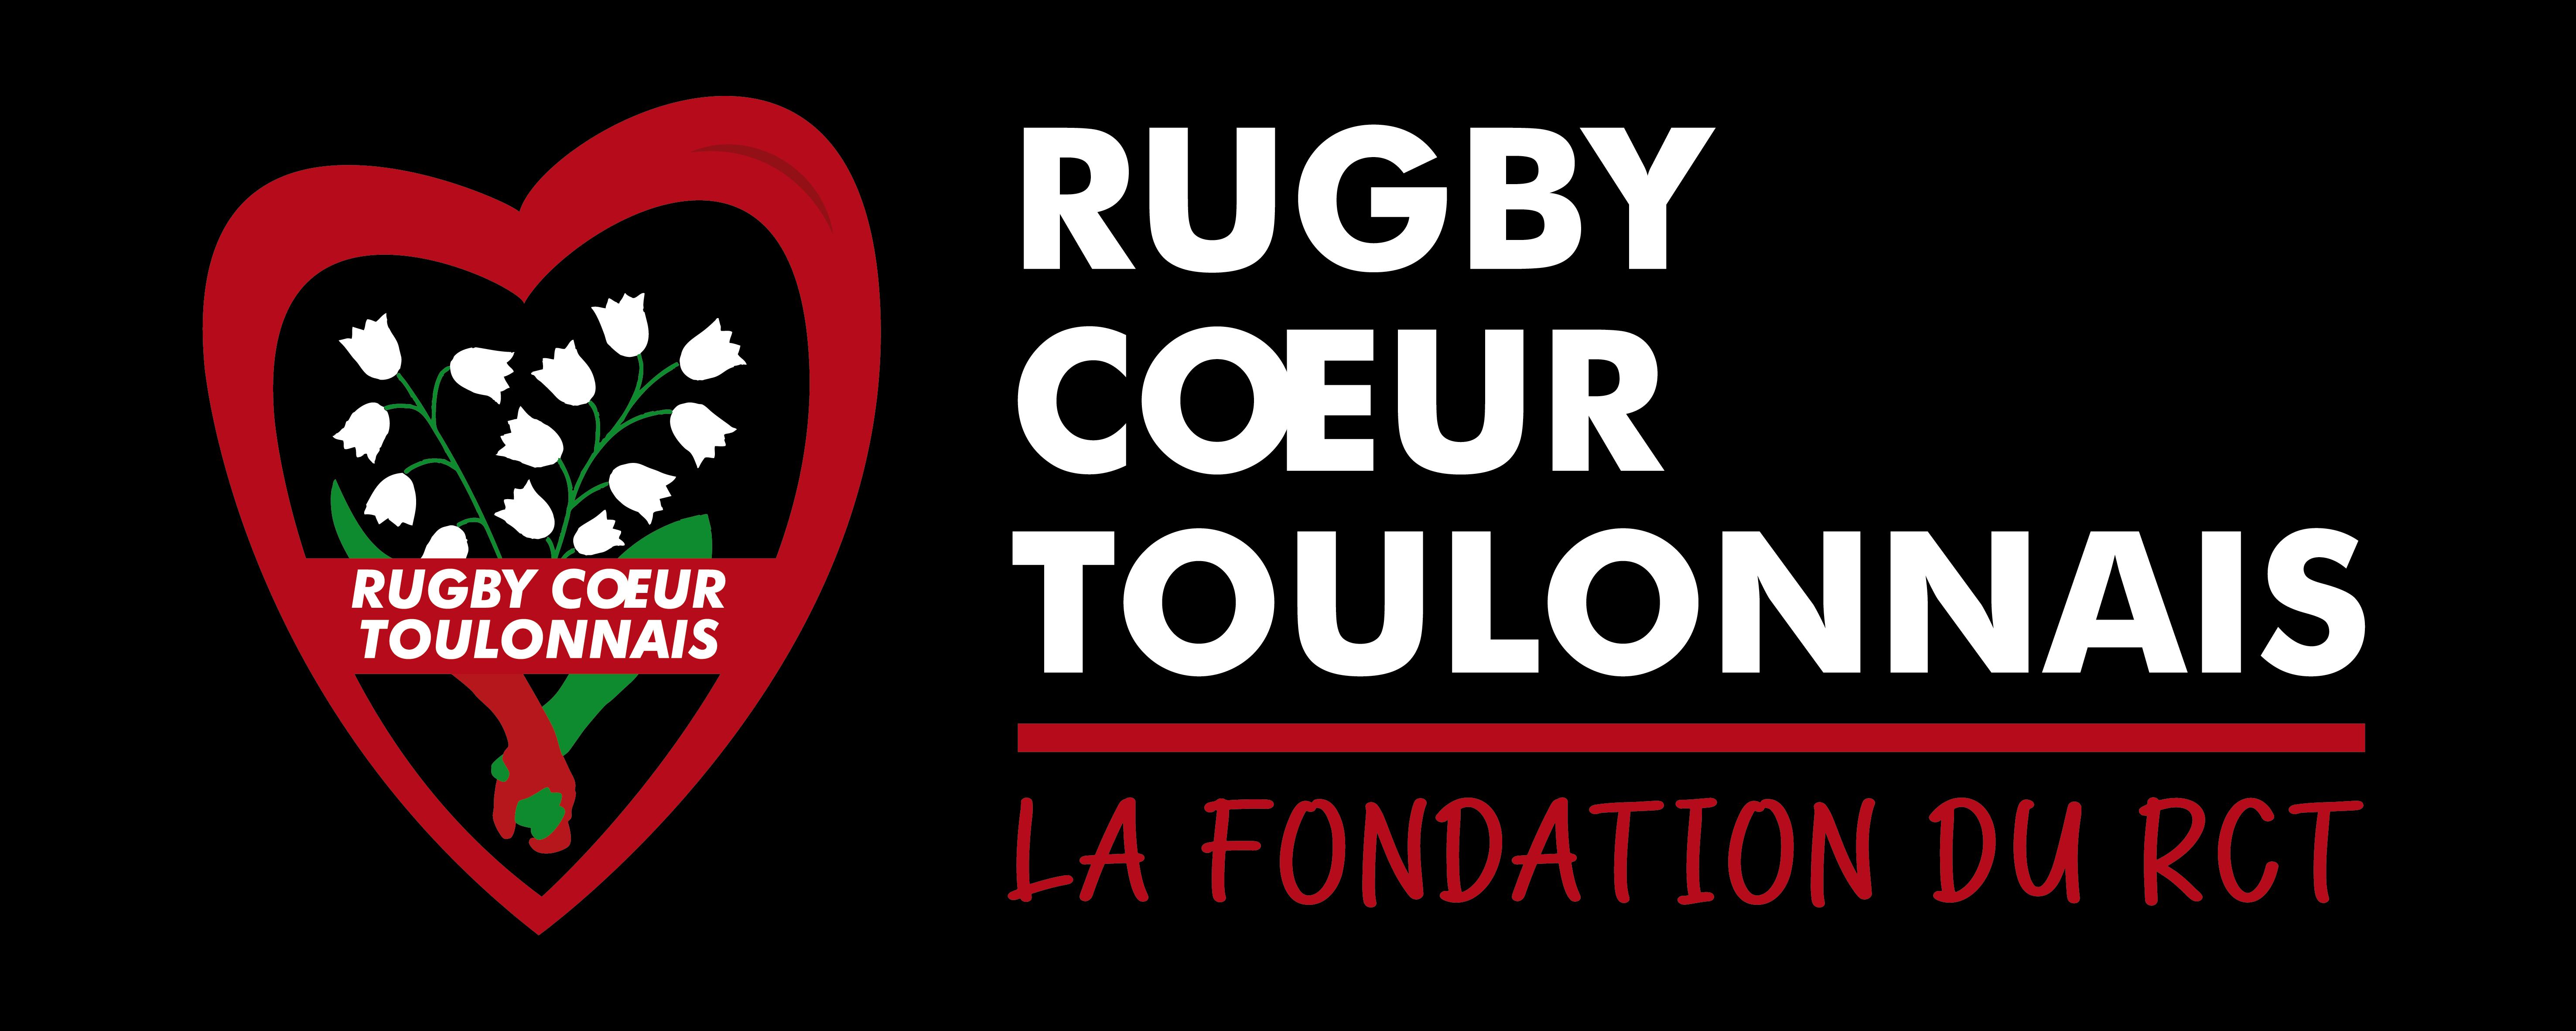 bloc_marque_rugby_coeur_toulonnais_fond_noir